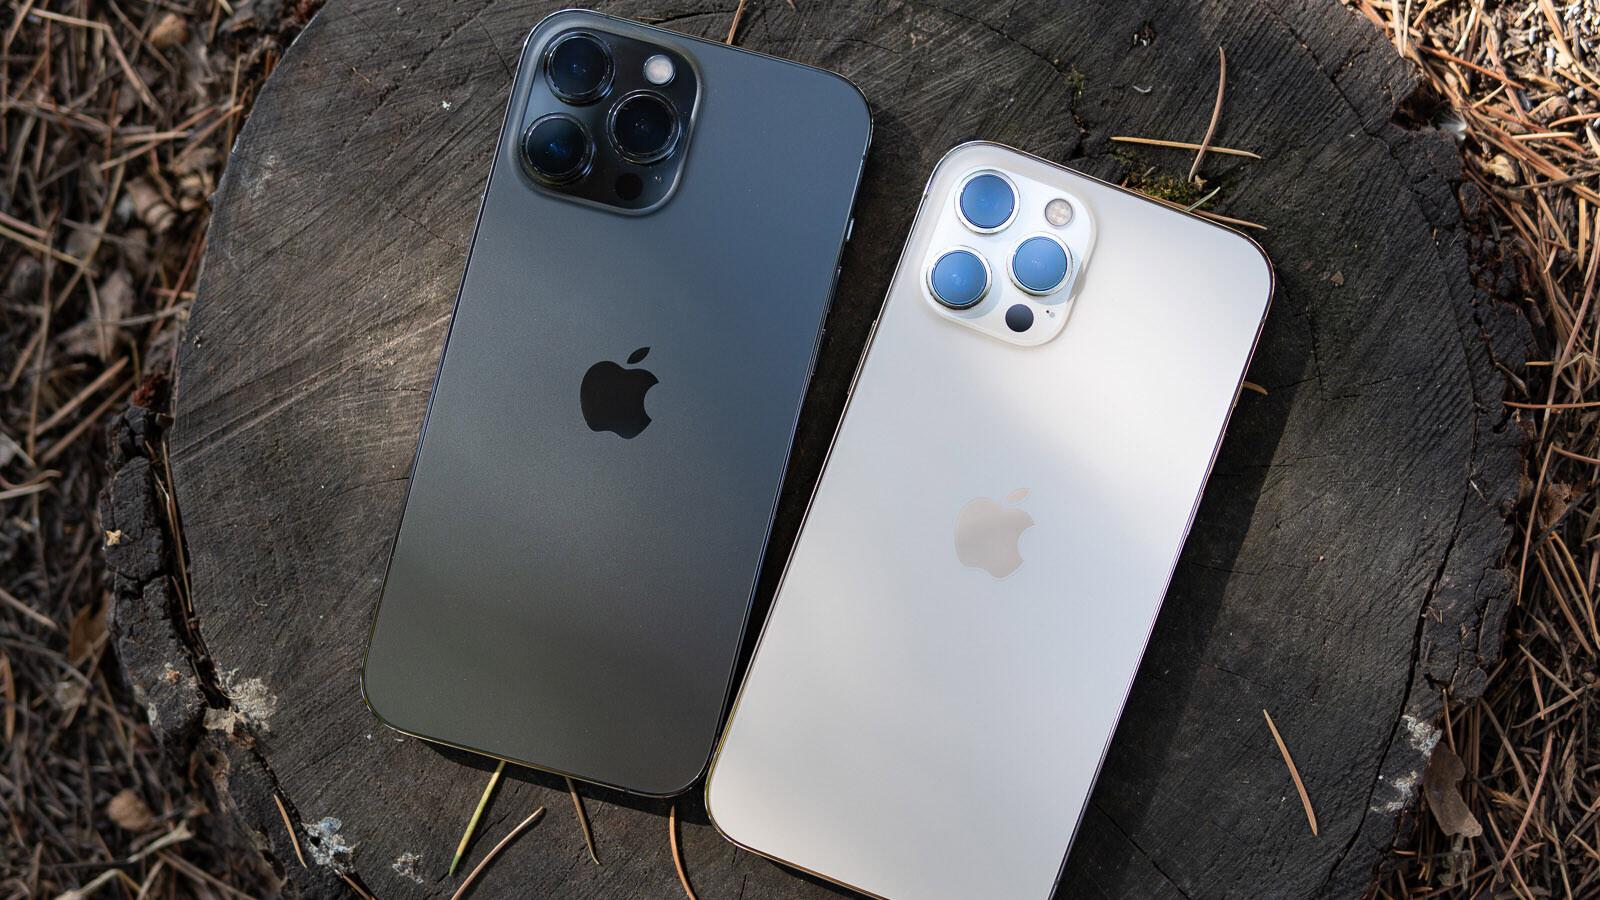 iPhone 13 Pro Max vs iPhone 12 Pro Max